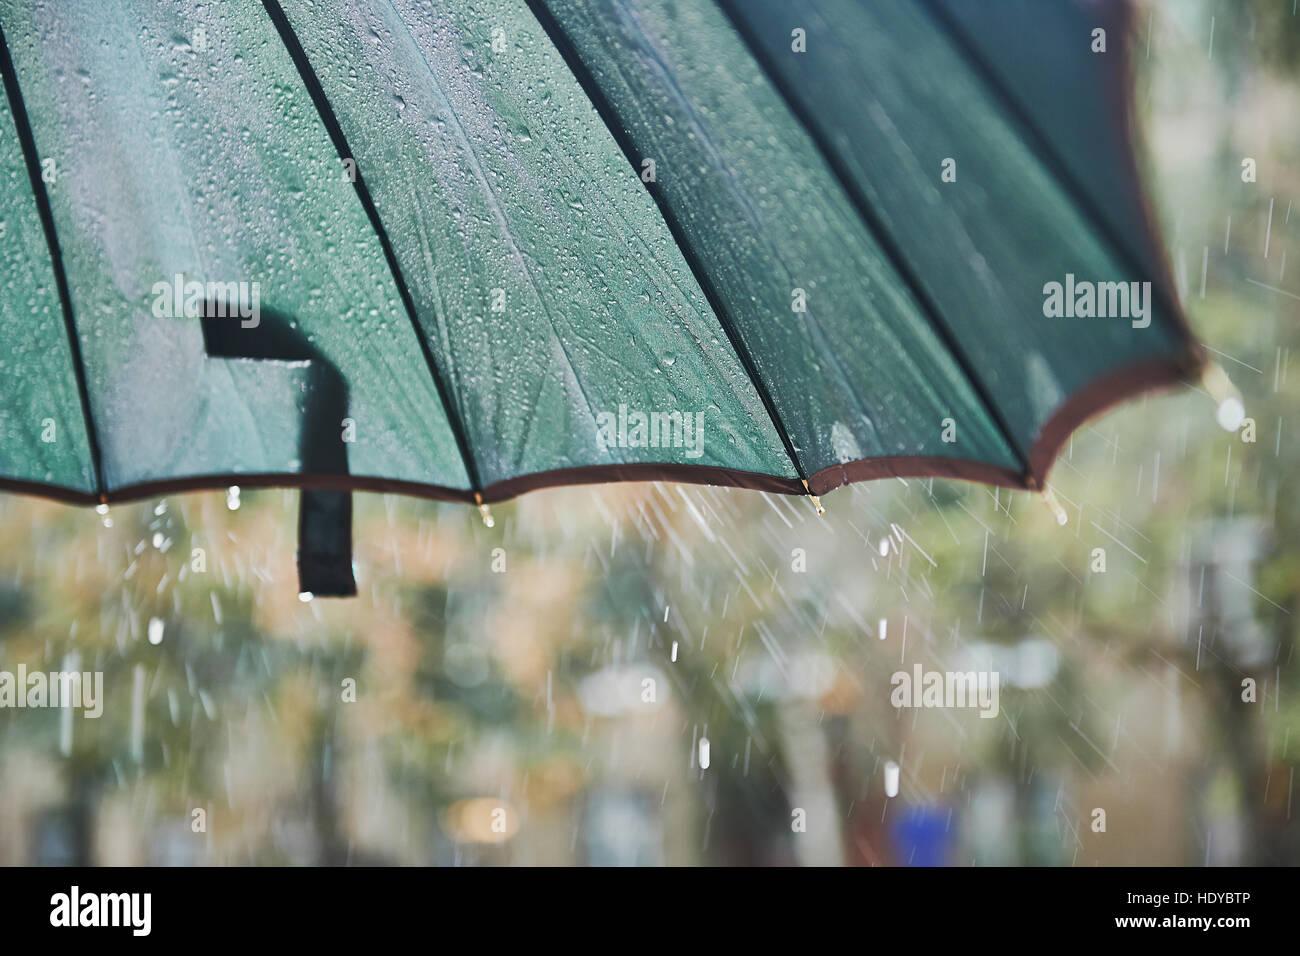 Rain drops falling from the umbrella. Cloudy, damp. - Stock Image